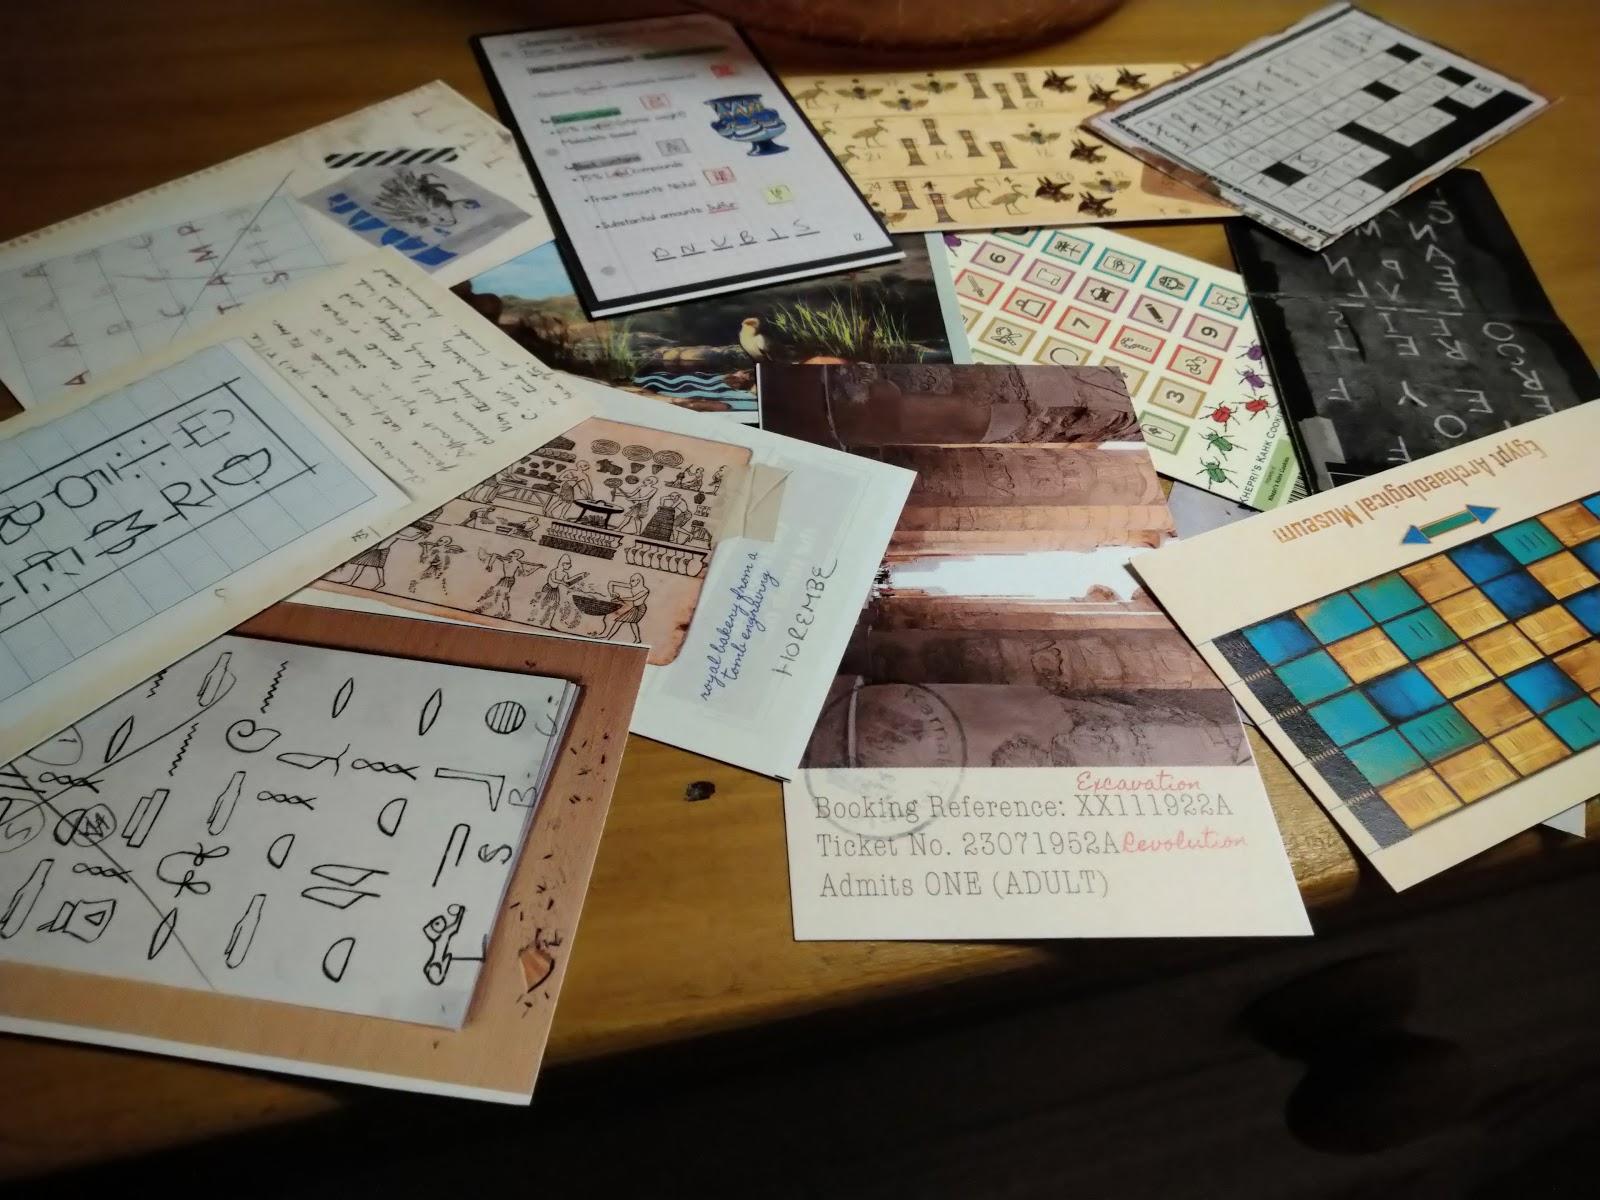 Crypt X Kickstarter Preview - Inside The Box Board Games - A